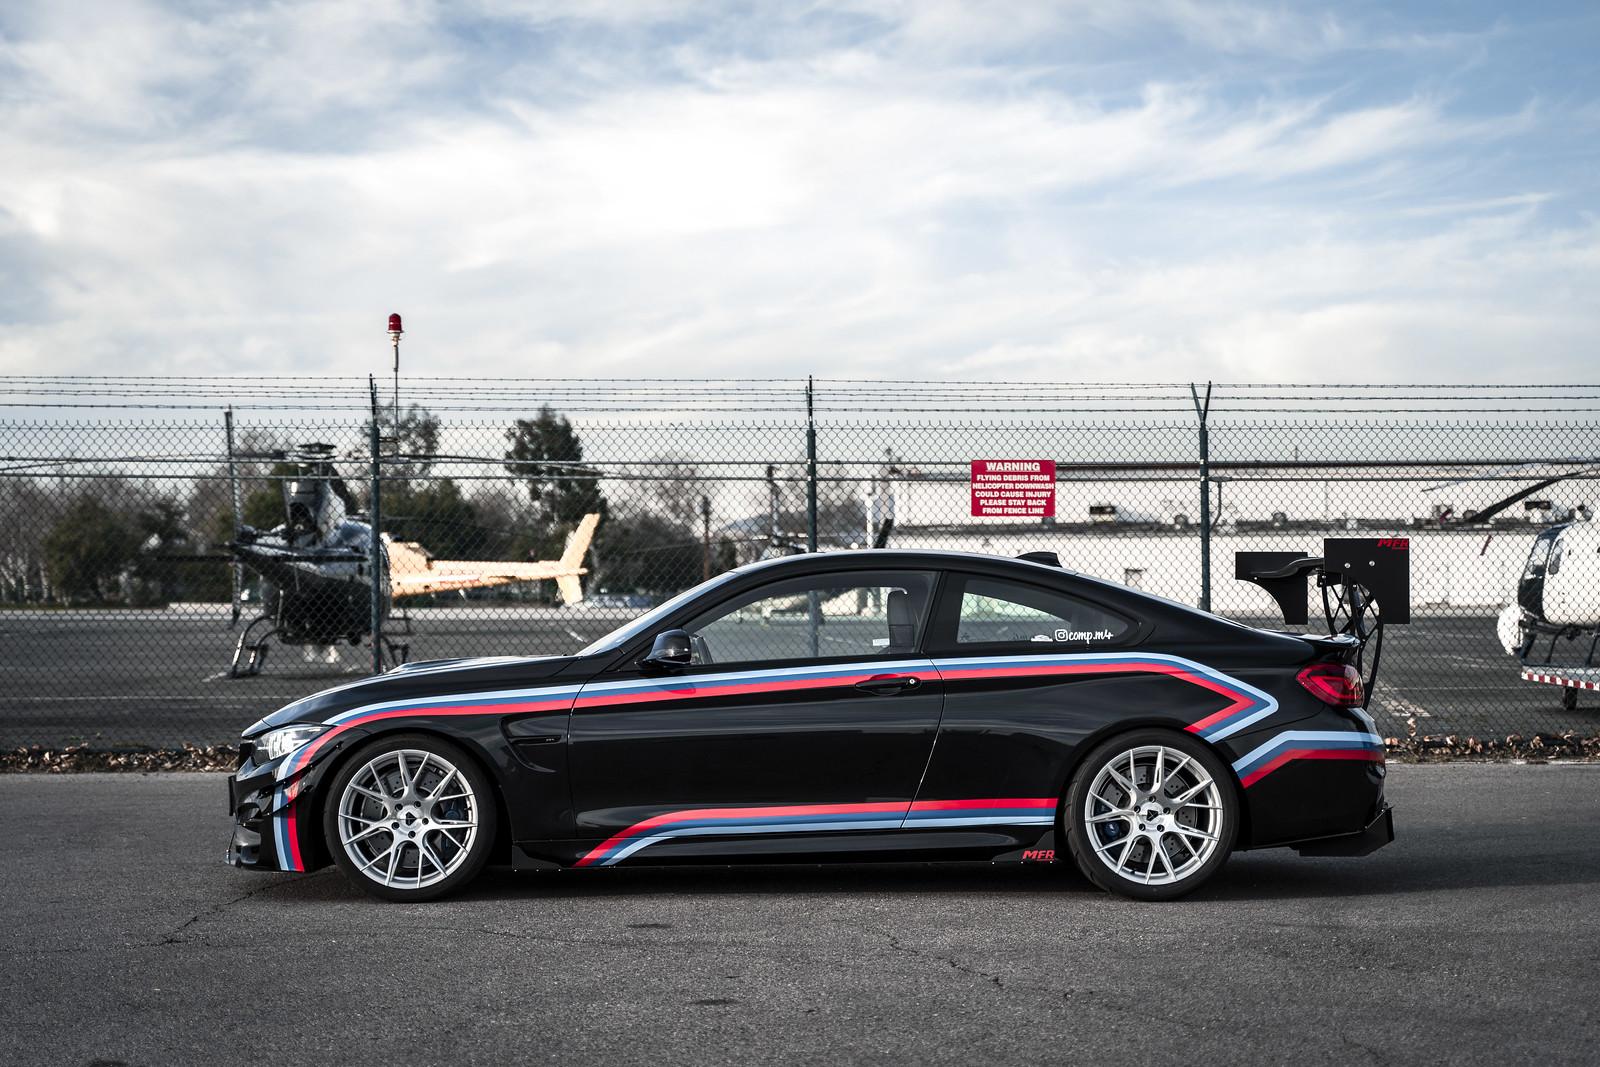 2018_BMW_M4_Competition_BDF18_Silver_7